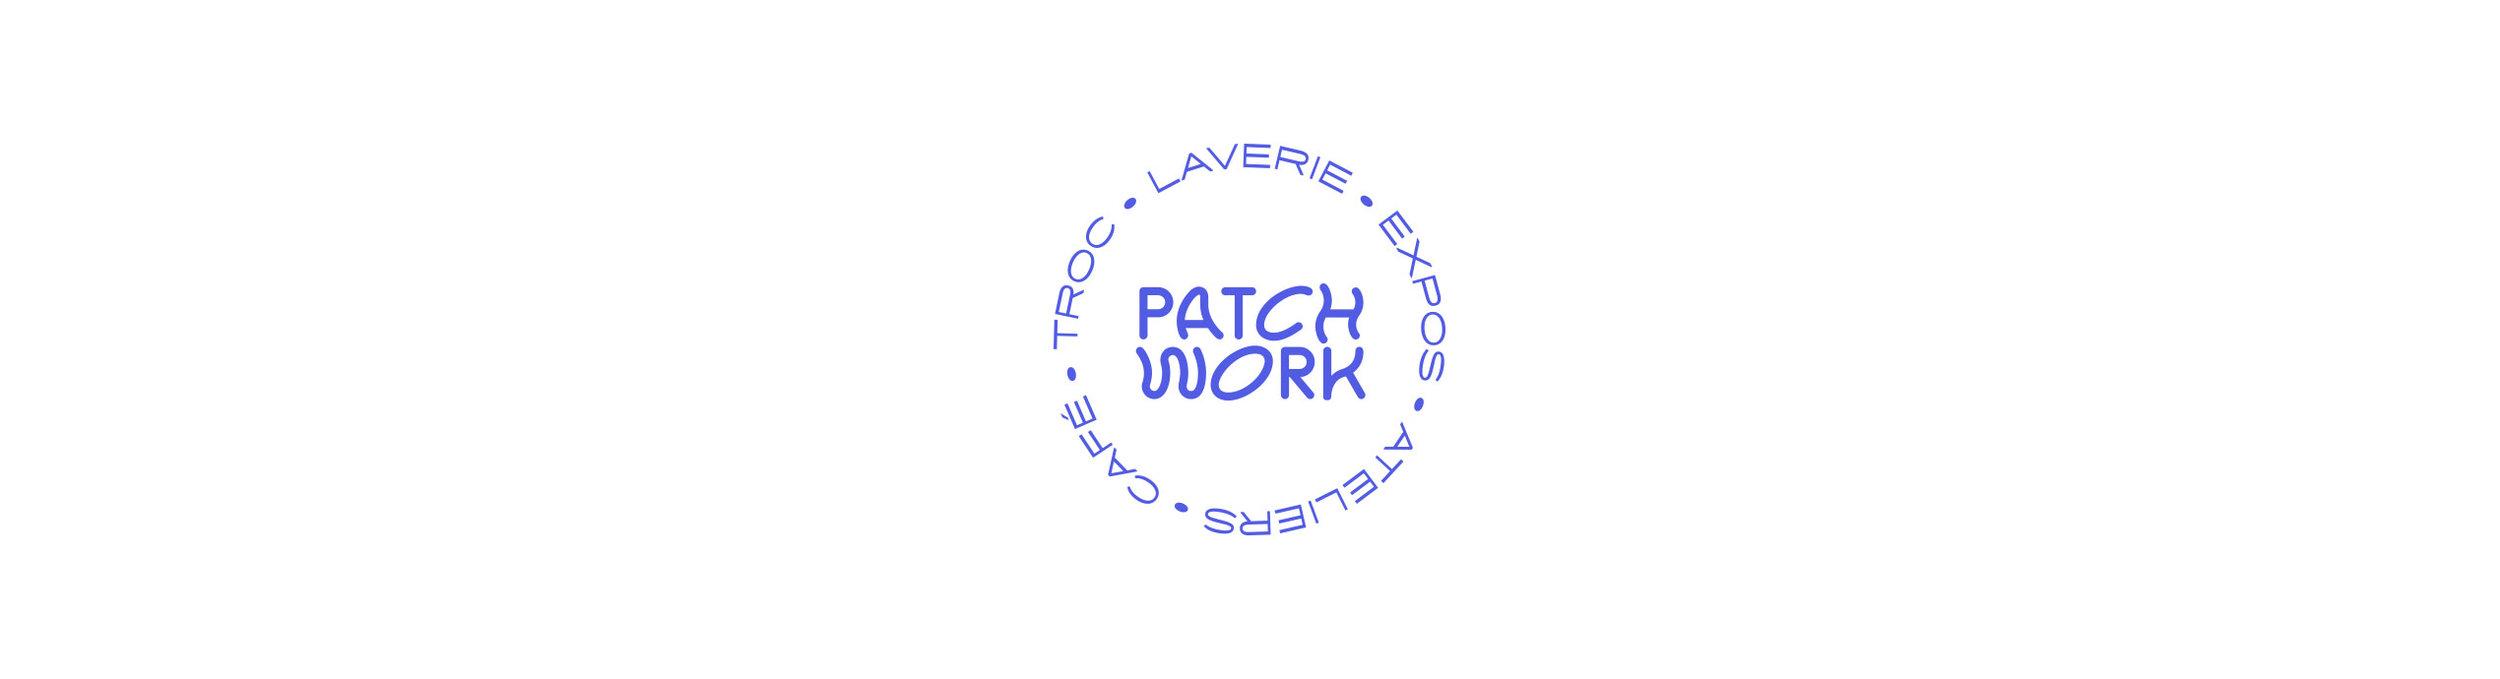 patchwork_logo.jpg